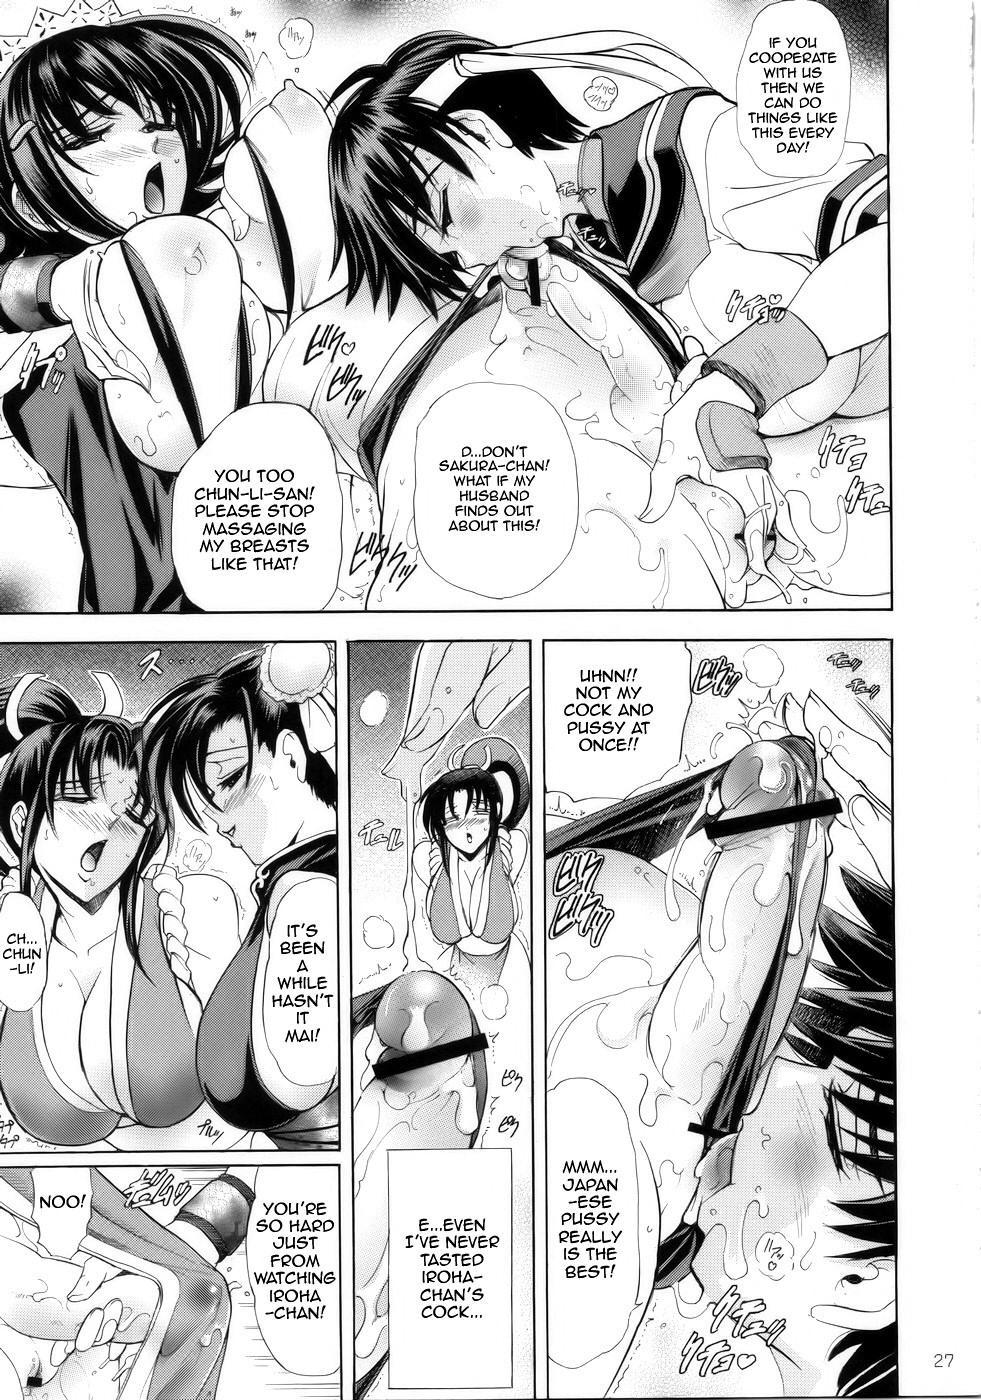 (C75) [Kawaraya Honpo (Kawaraya A-ta)] Hana - Maki no Juunana - Housenka (Street Fighter) [English] [Yuribou] 25